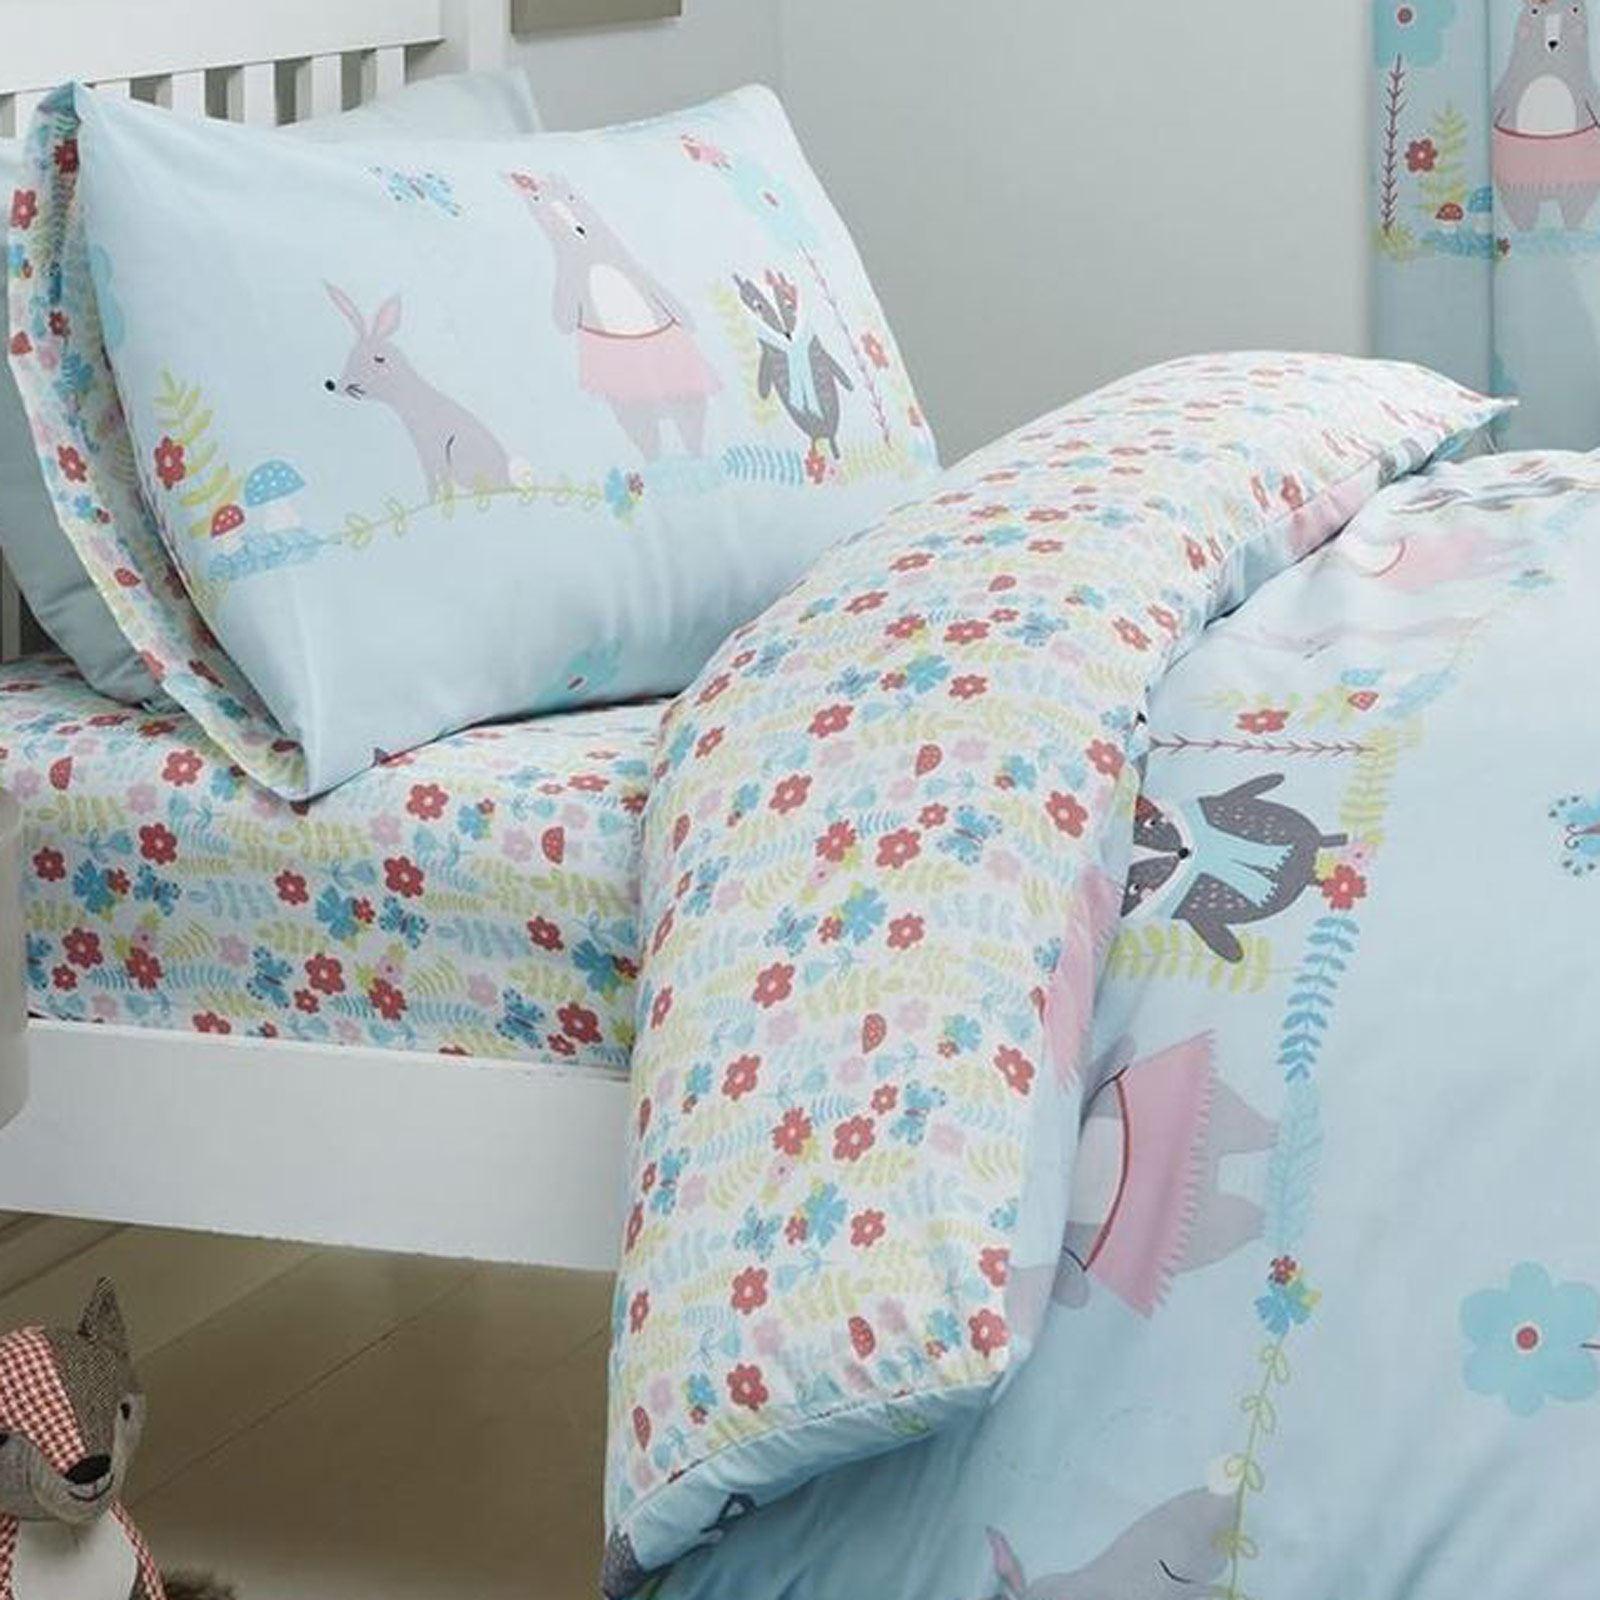 Kids-Duvet-Covers-Blue-Woodland-Animals-Cute-Reversible-Print-Quilt-Bedding-Sets thumbnail 4